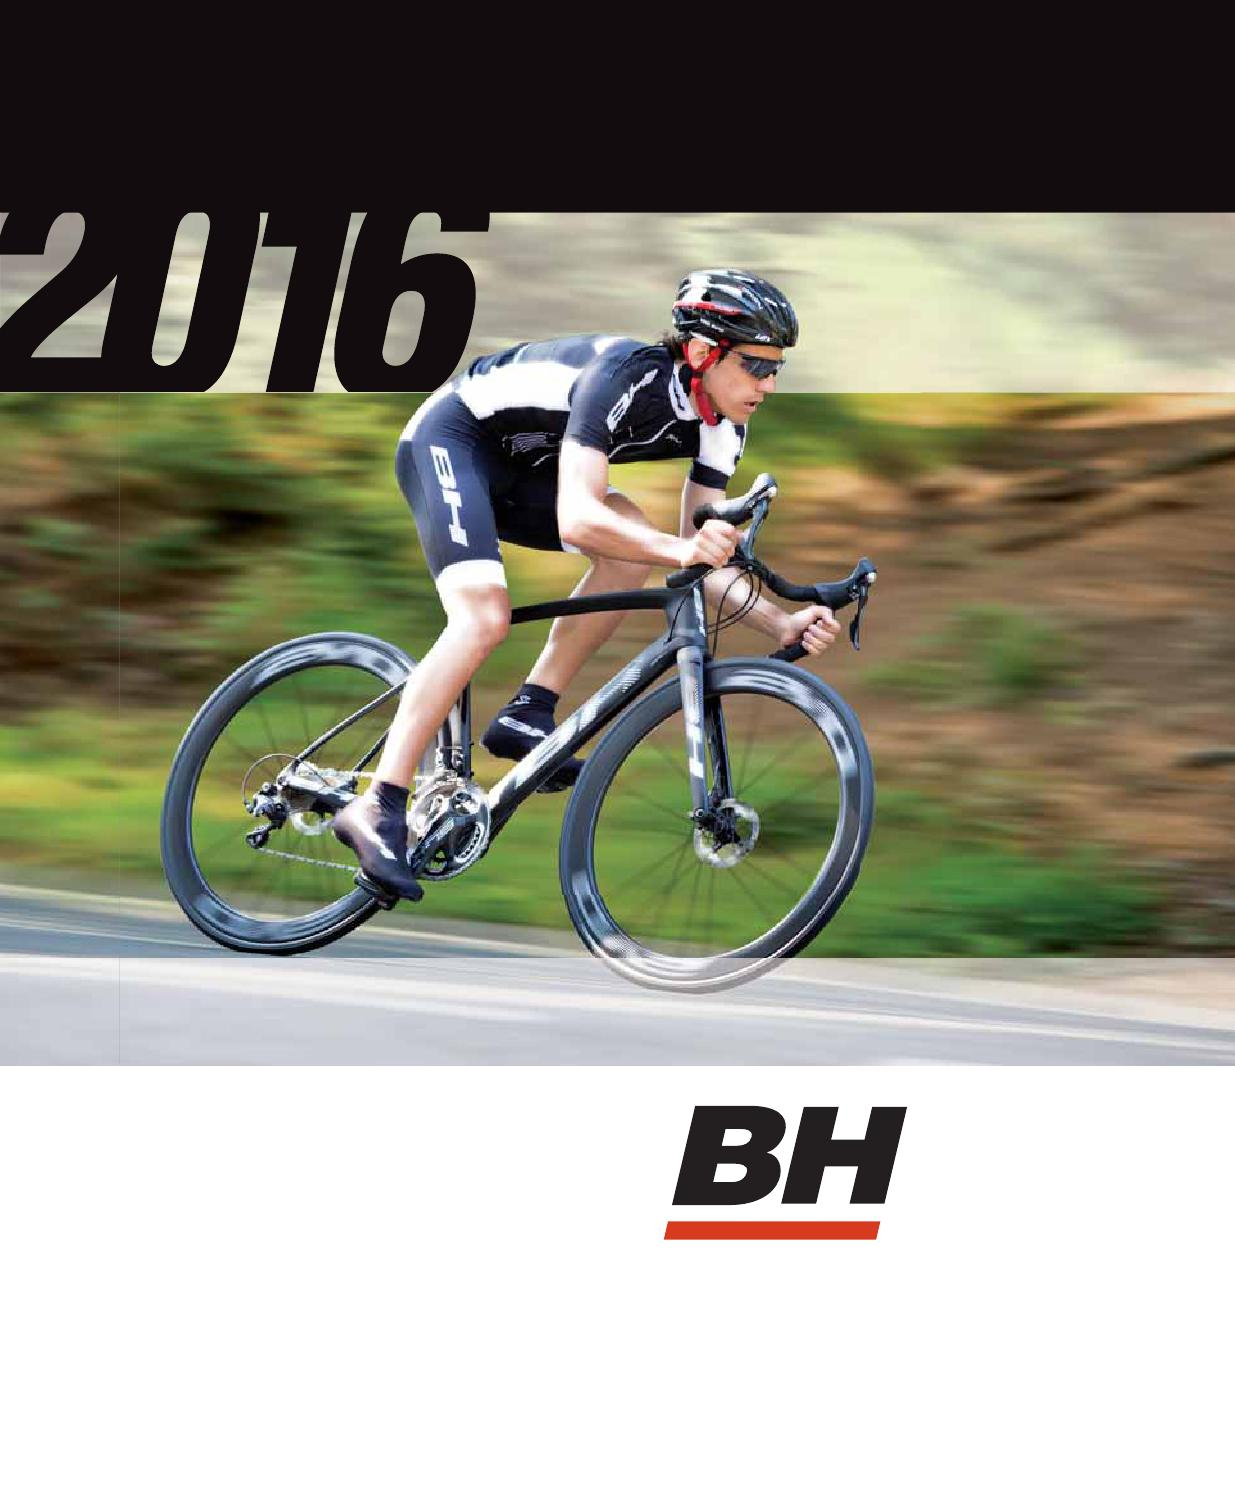 Catálogo de BH 2016 by TodoMountainBike - issuu